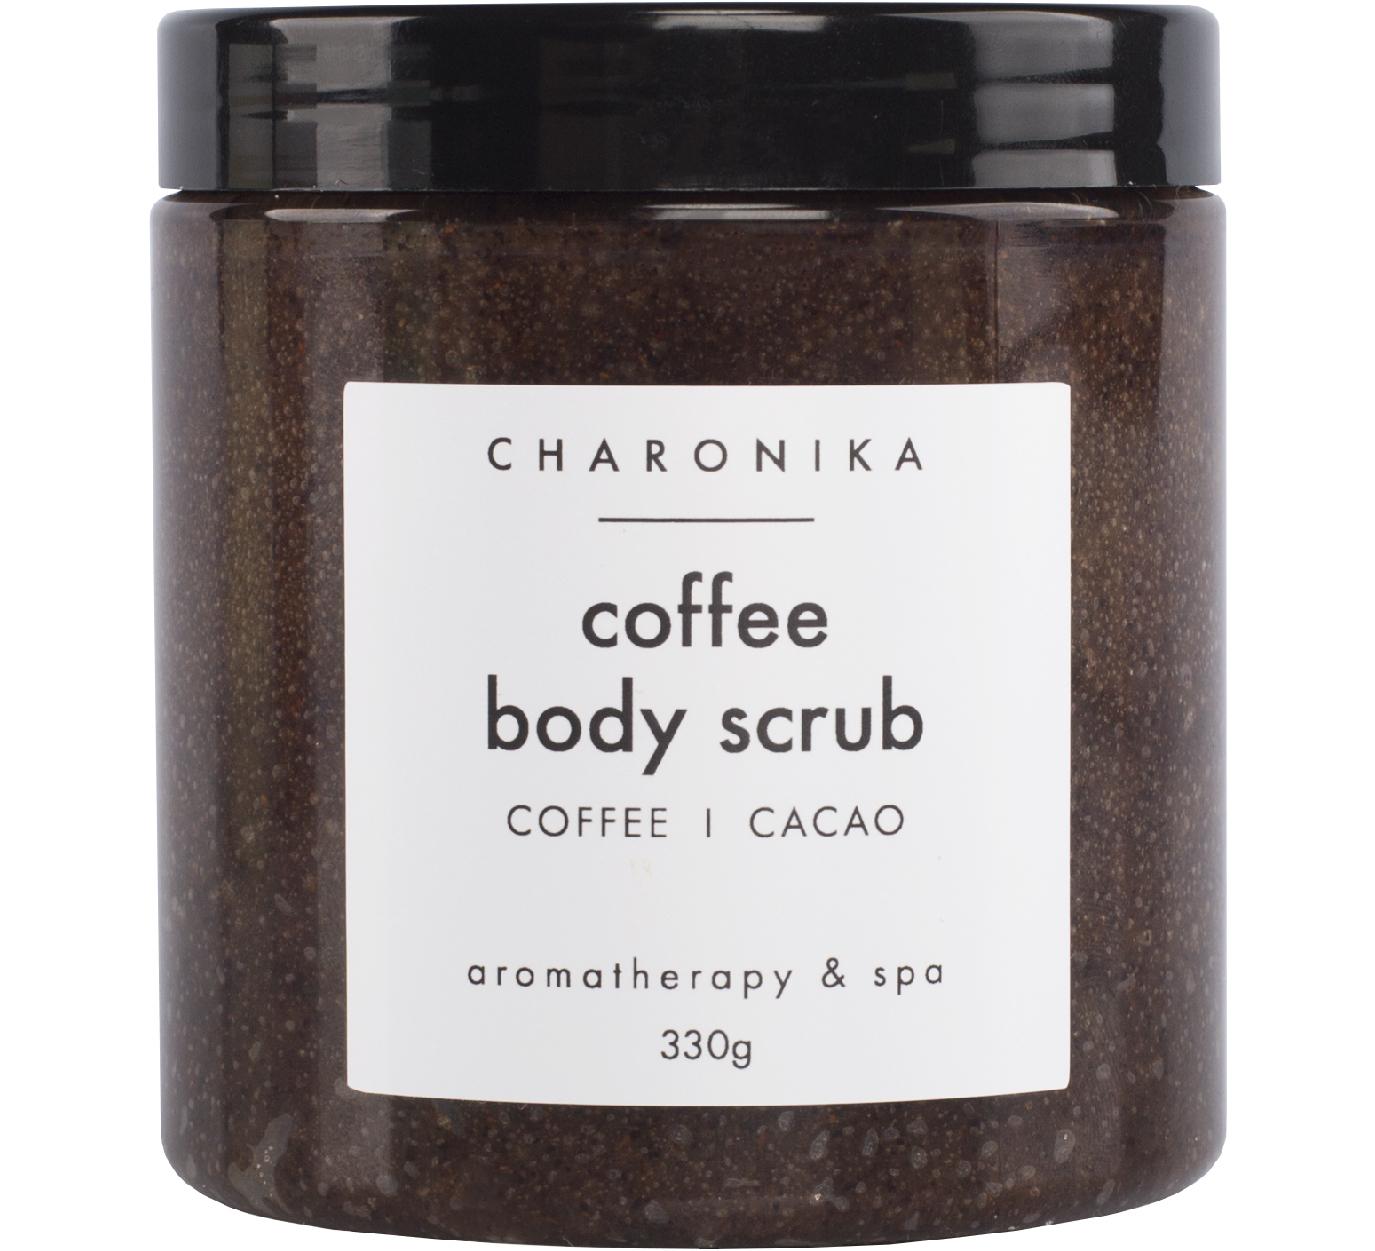 Скраб кремовый CHARONIKA Coffee Body Scrub 330 гр (кофе, какао)